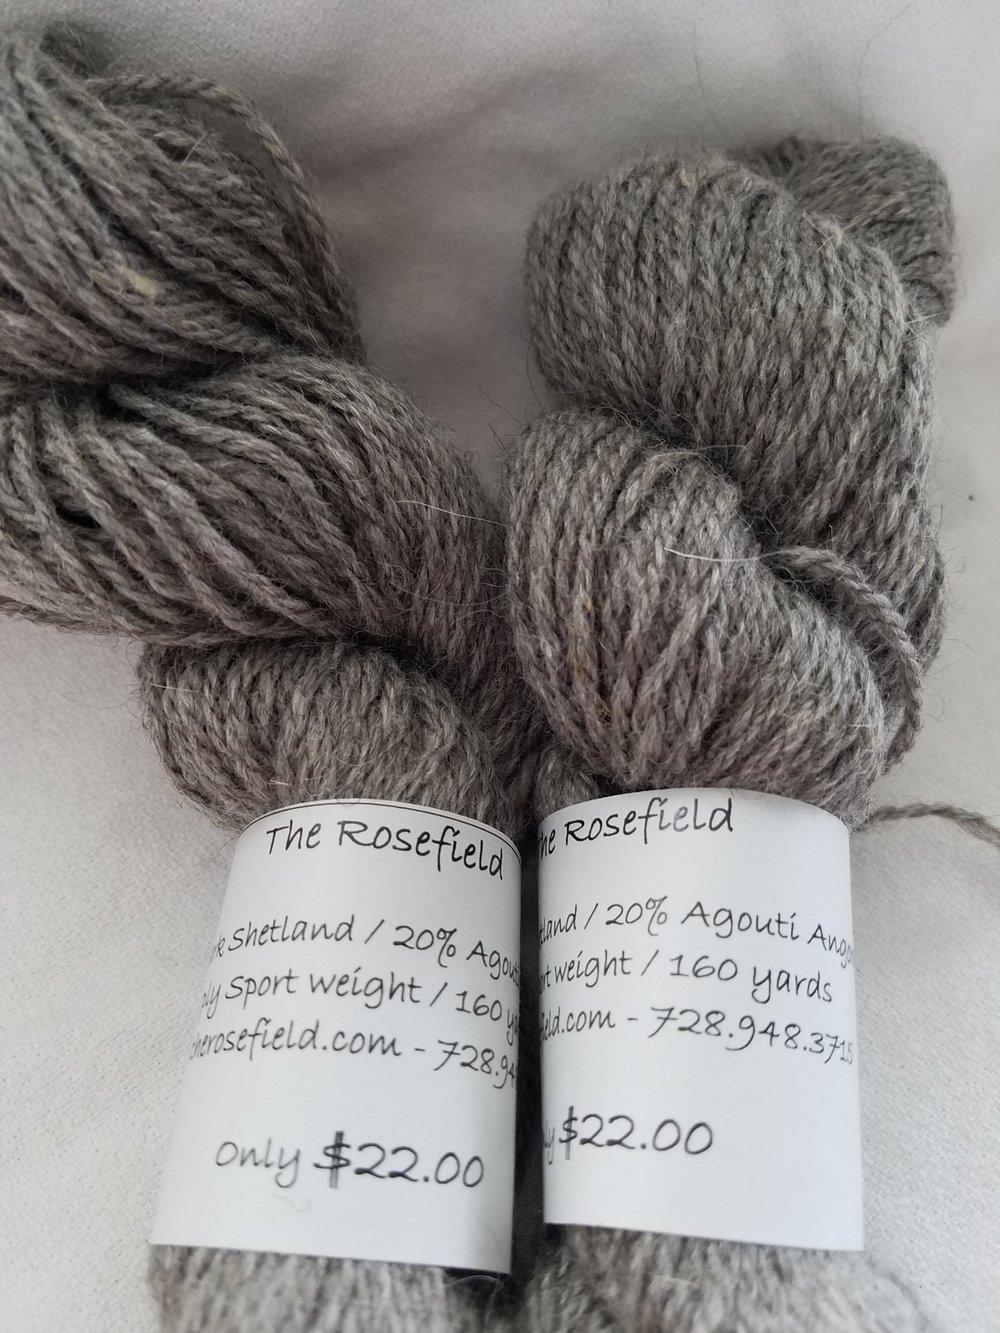 12. Dk Shetland/Agouti Angora Sport weight